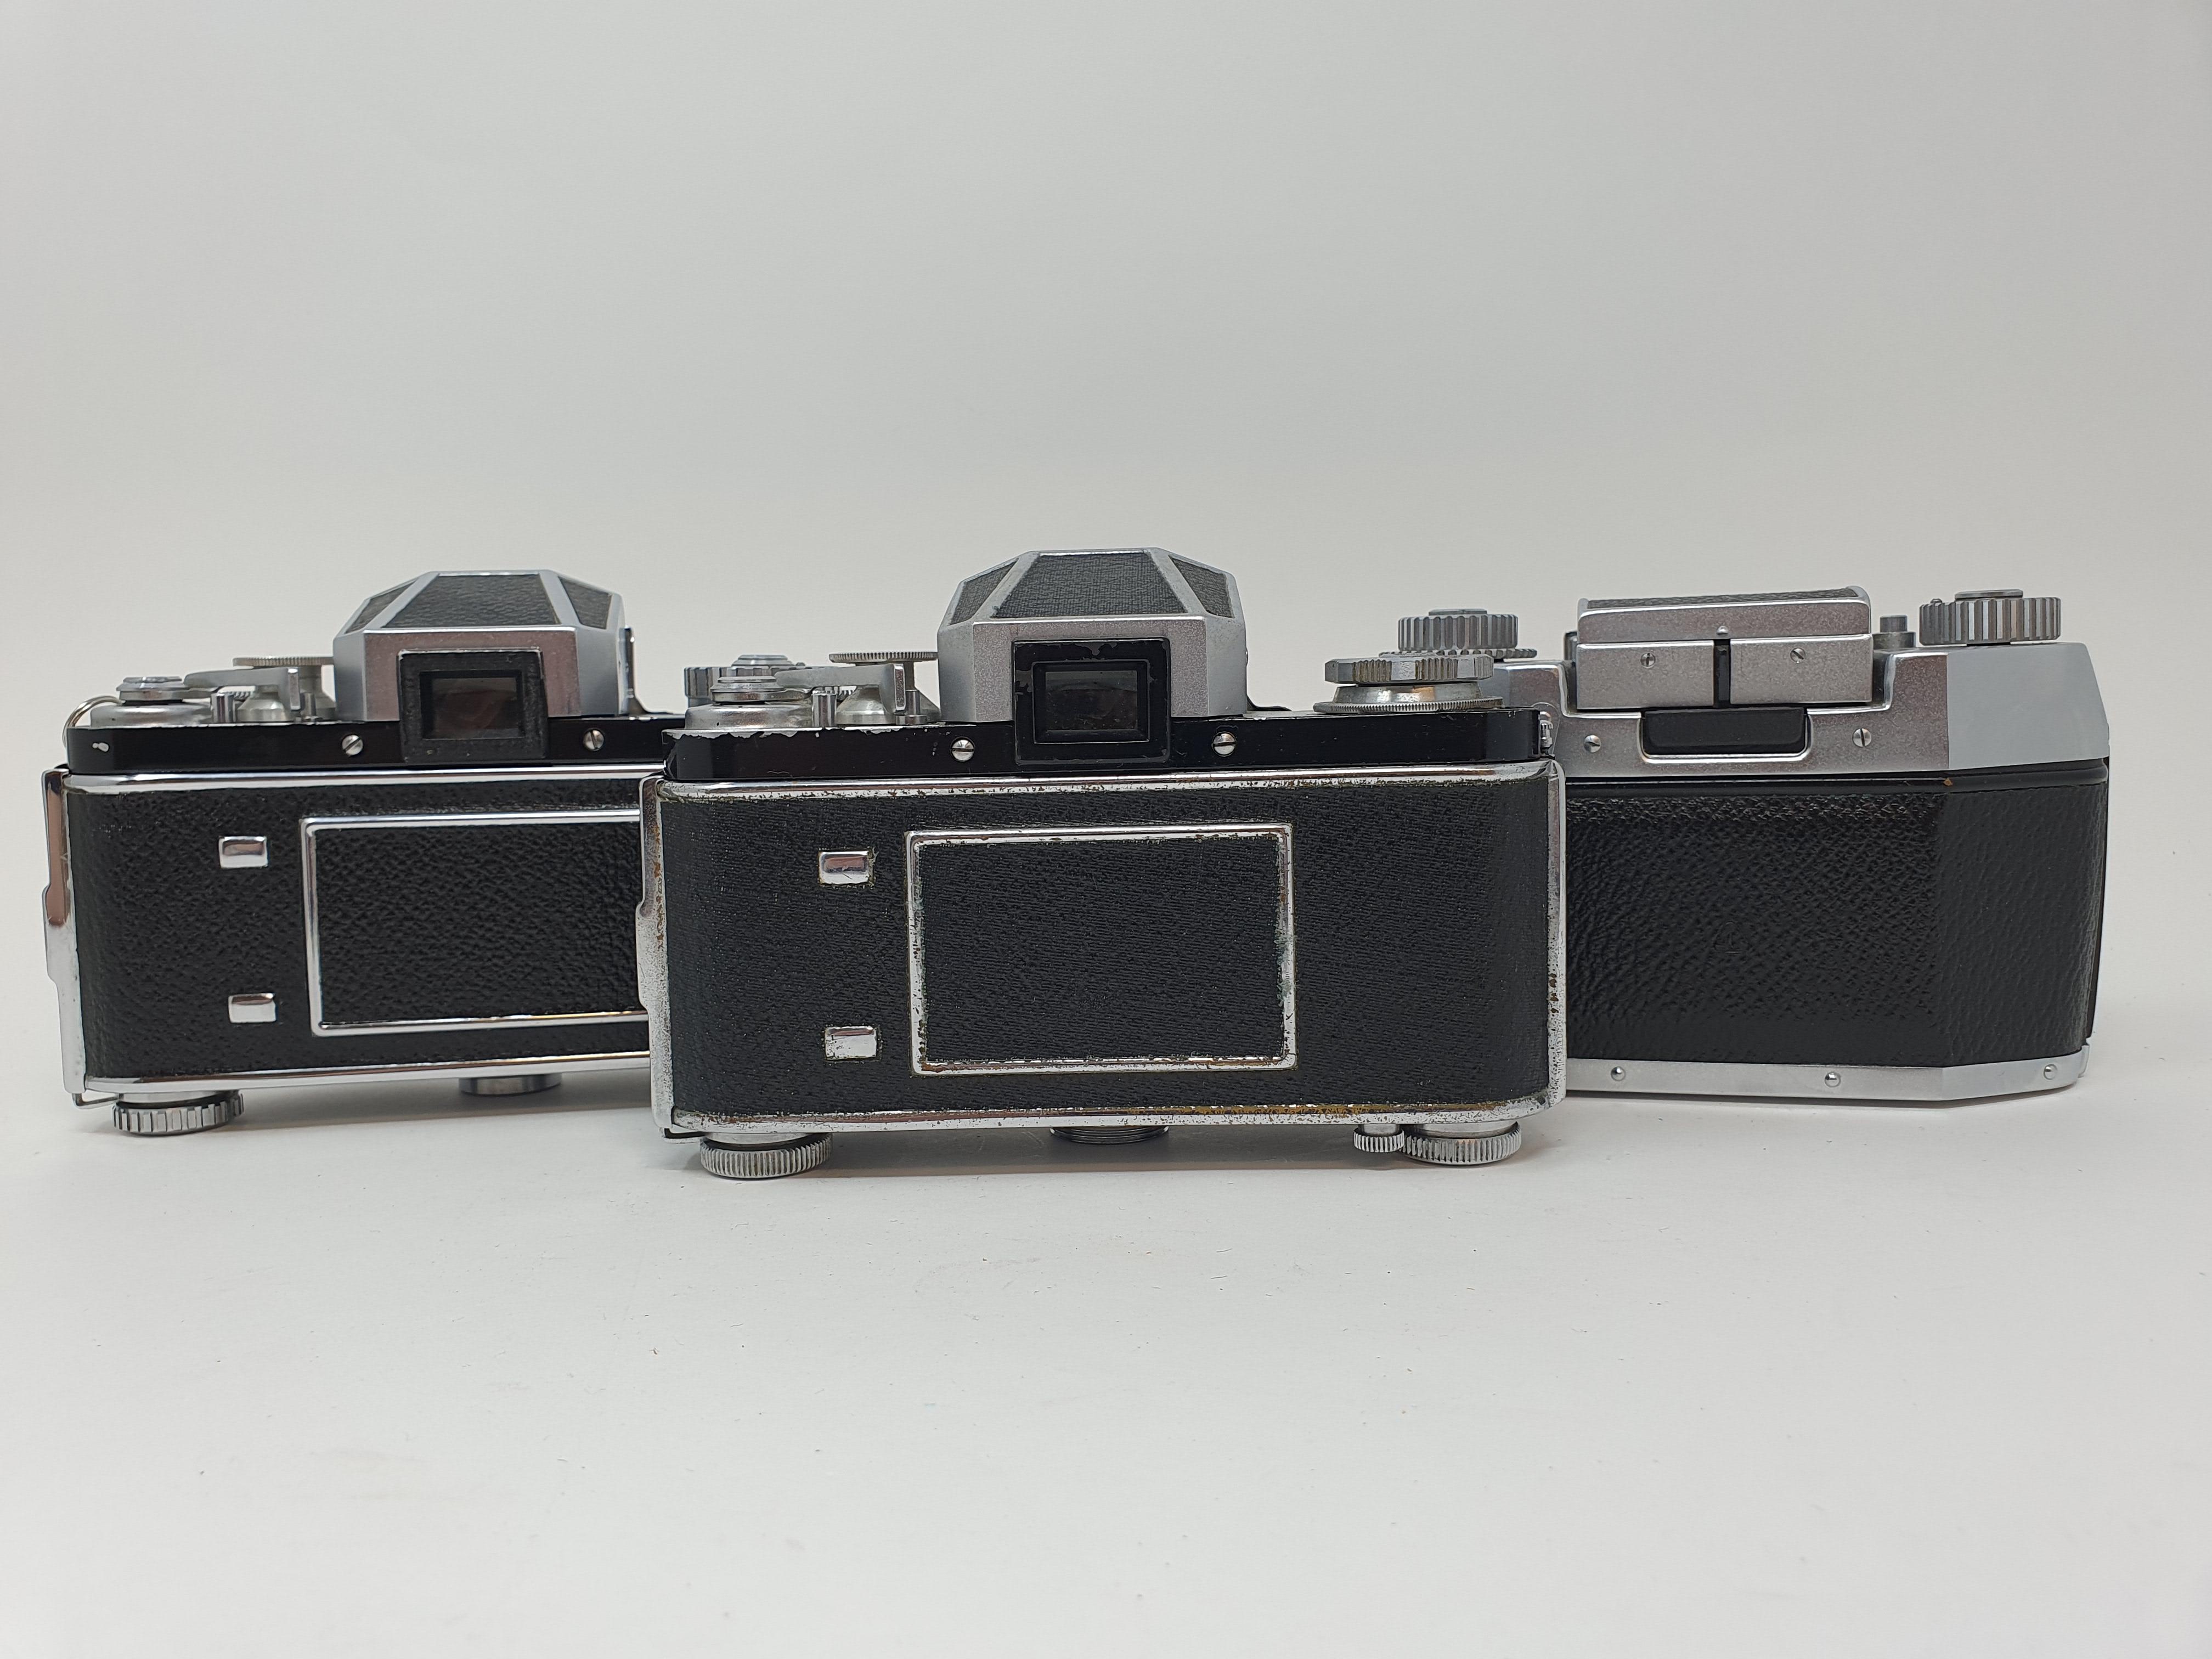 An Exakta Varex IIa camera, Varex IIb camera body, and an Exa. I (3) Provenance: Part of a vast - Image 6 of 6